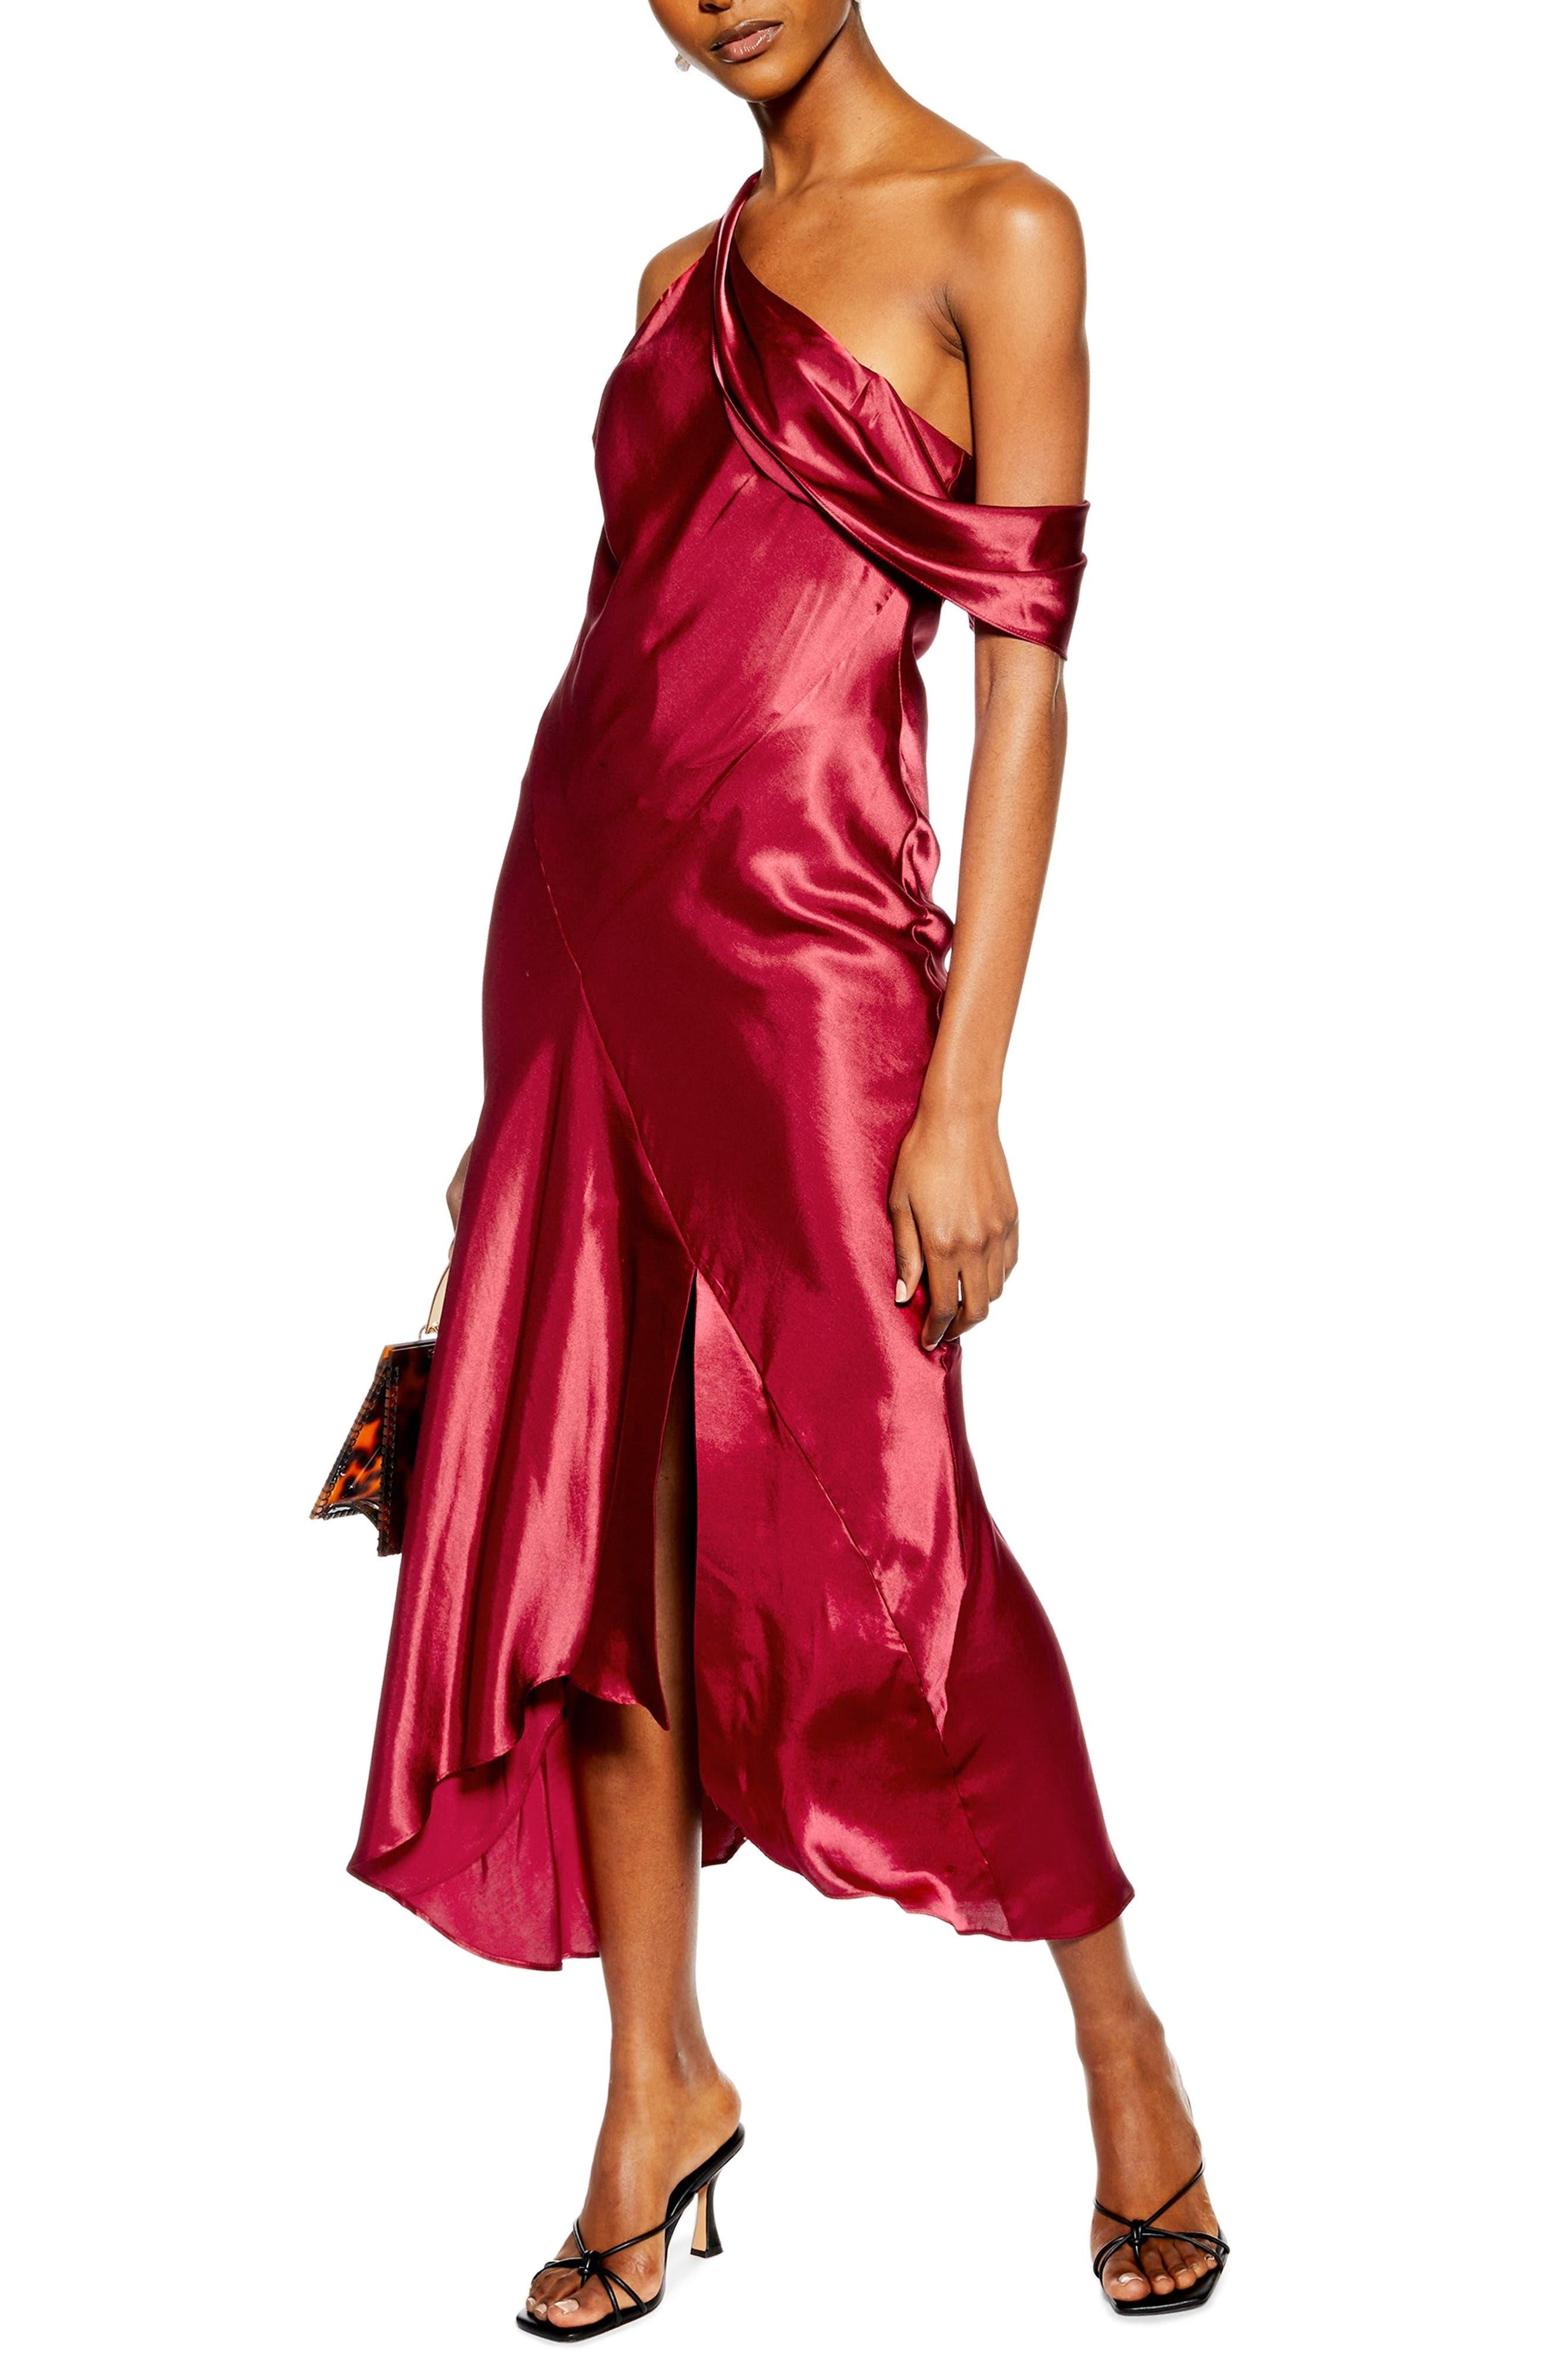 Topshop Asymmetrical Midi Dress, US (fits like 14) - Red